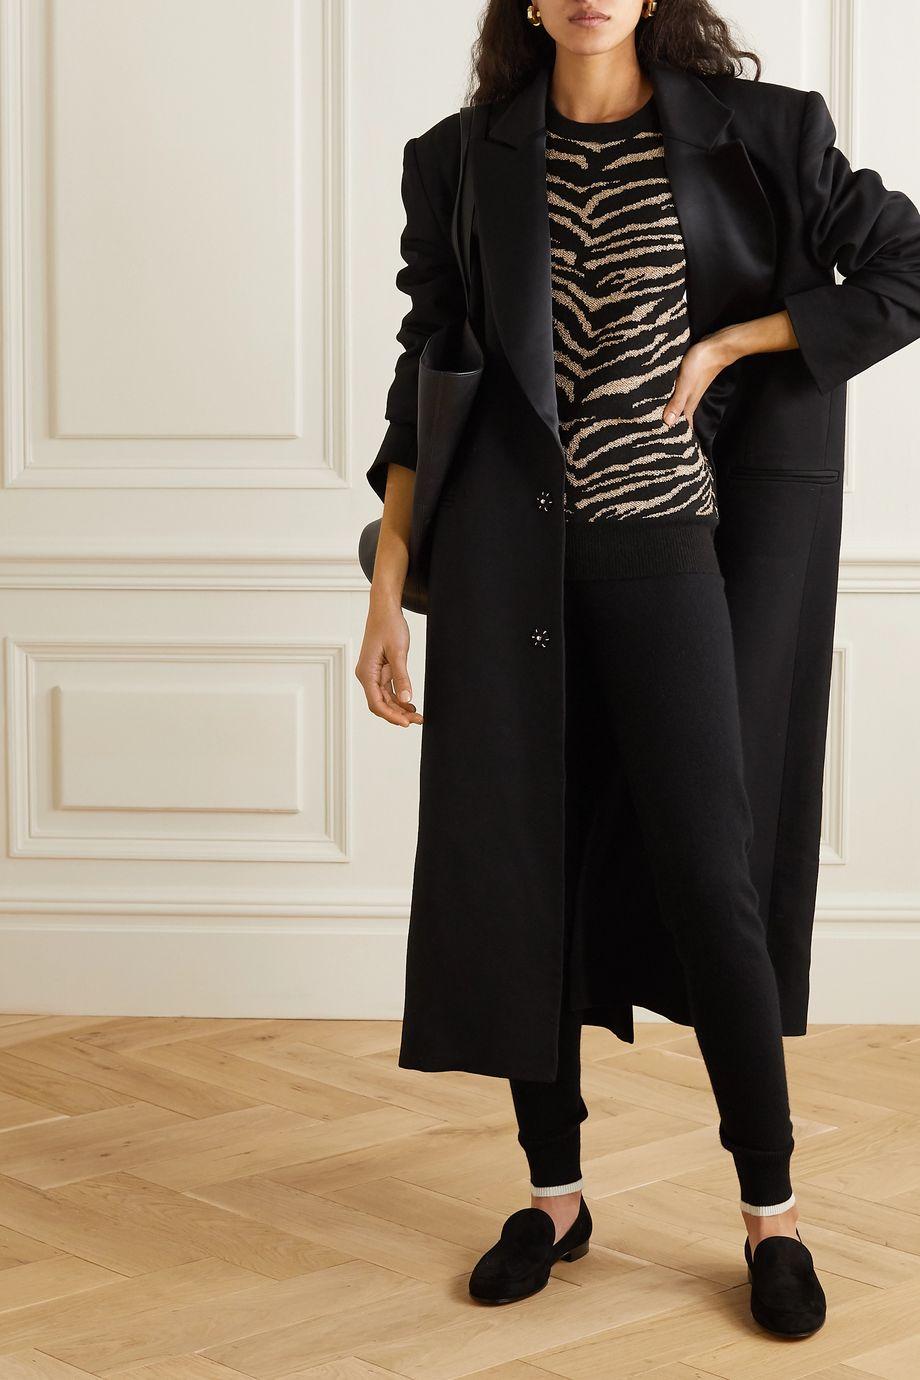 Madeleine Thompson Juno metallic tiger-intarsia wool and cashmere-blend sweater